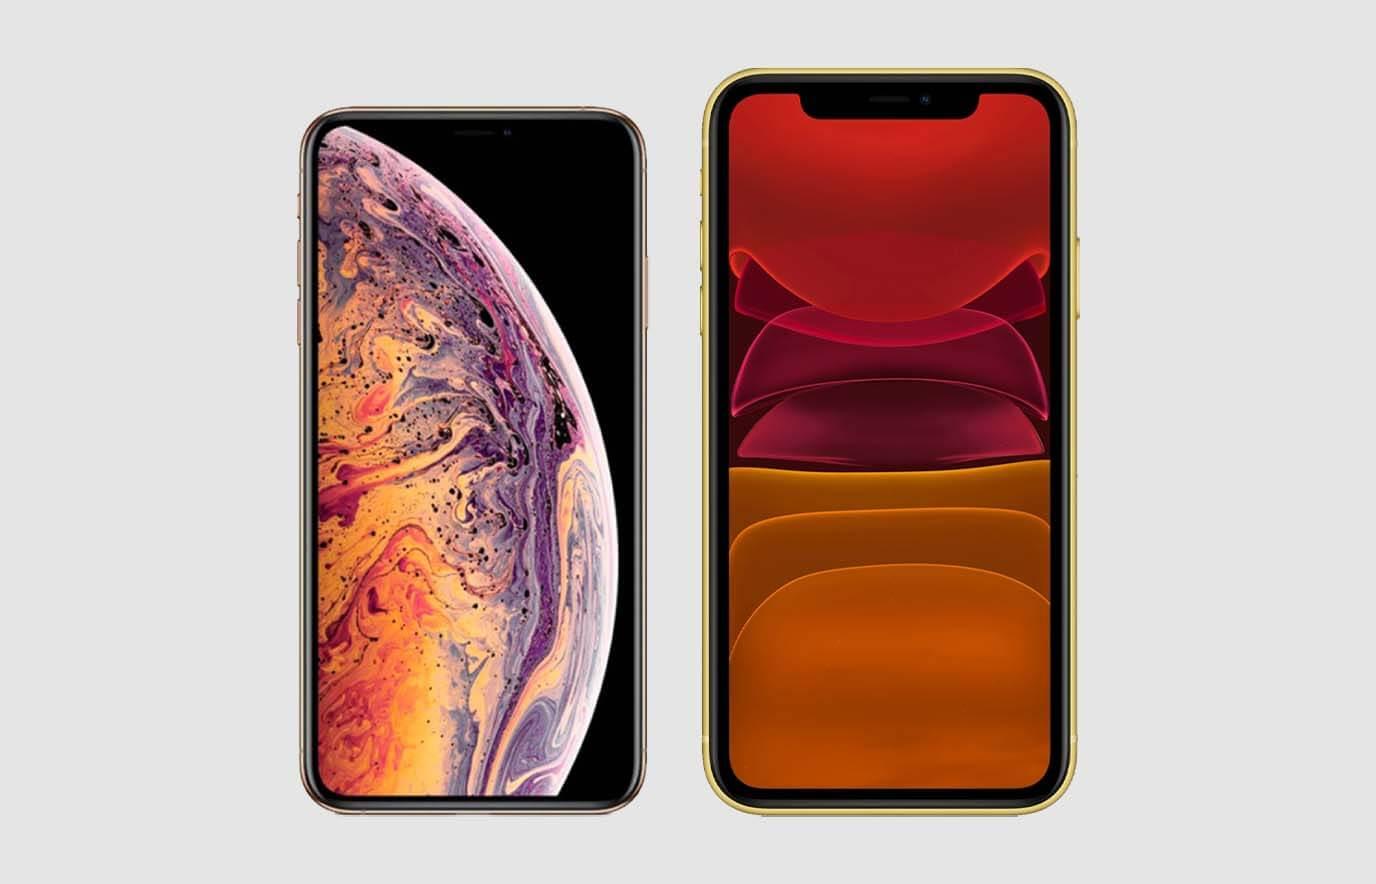 iPhone XS vs iPhone 11